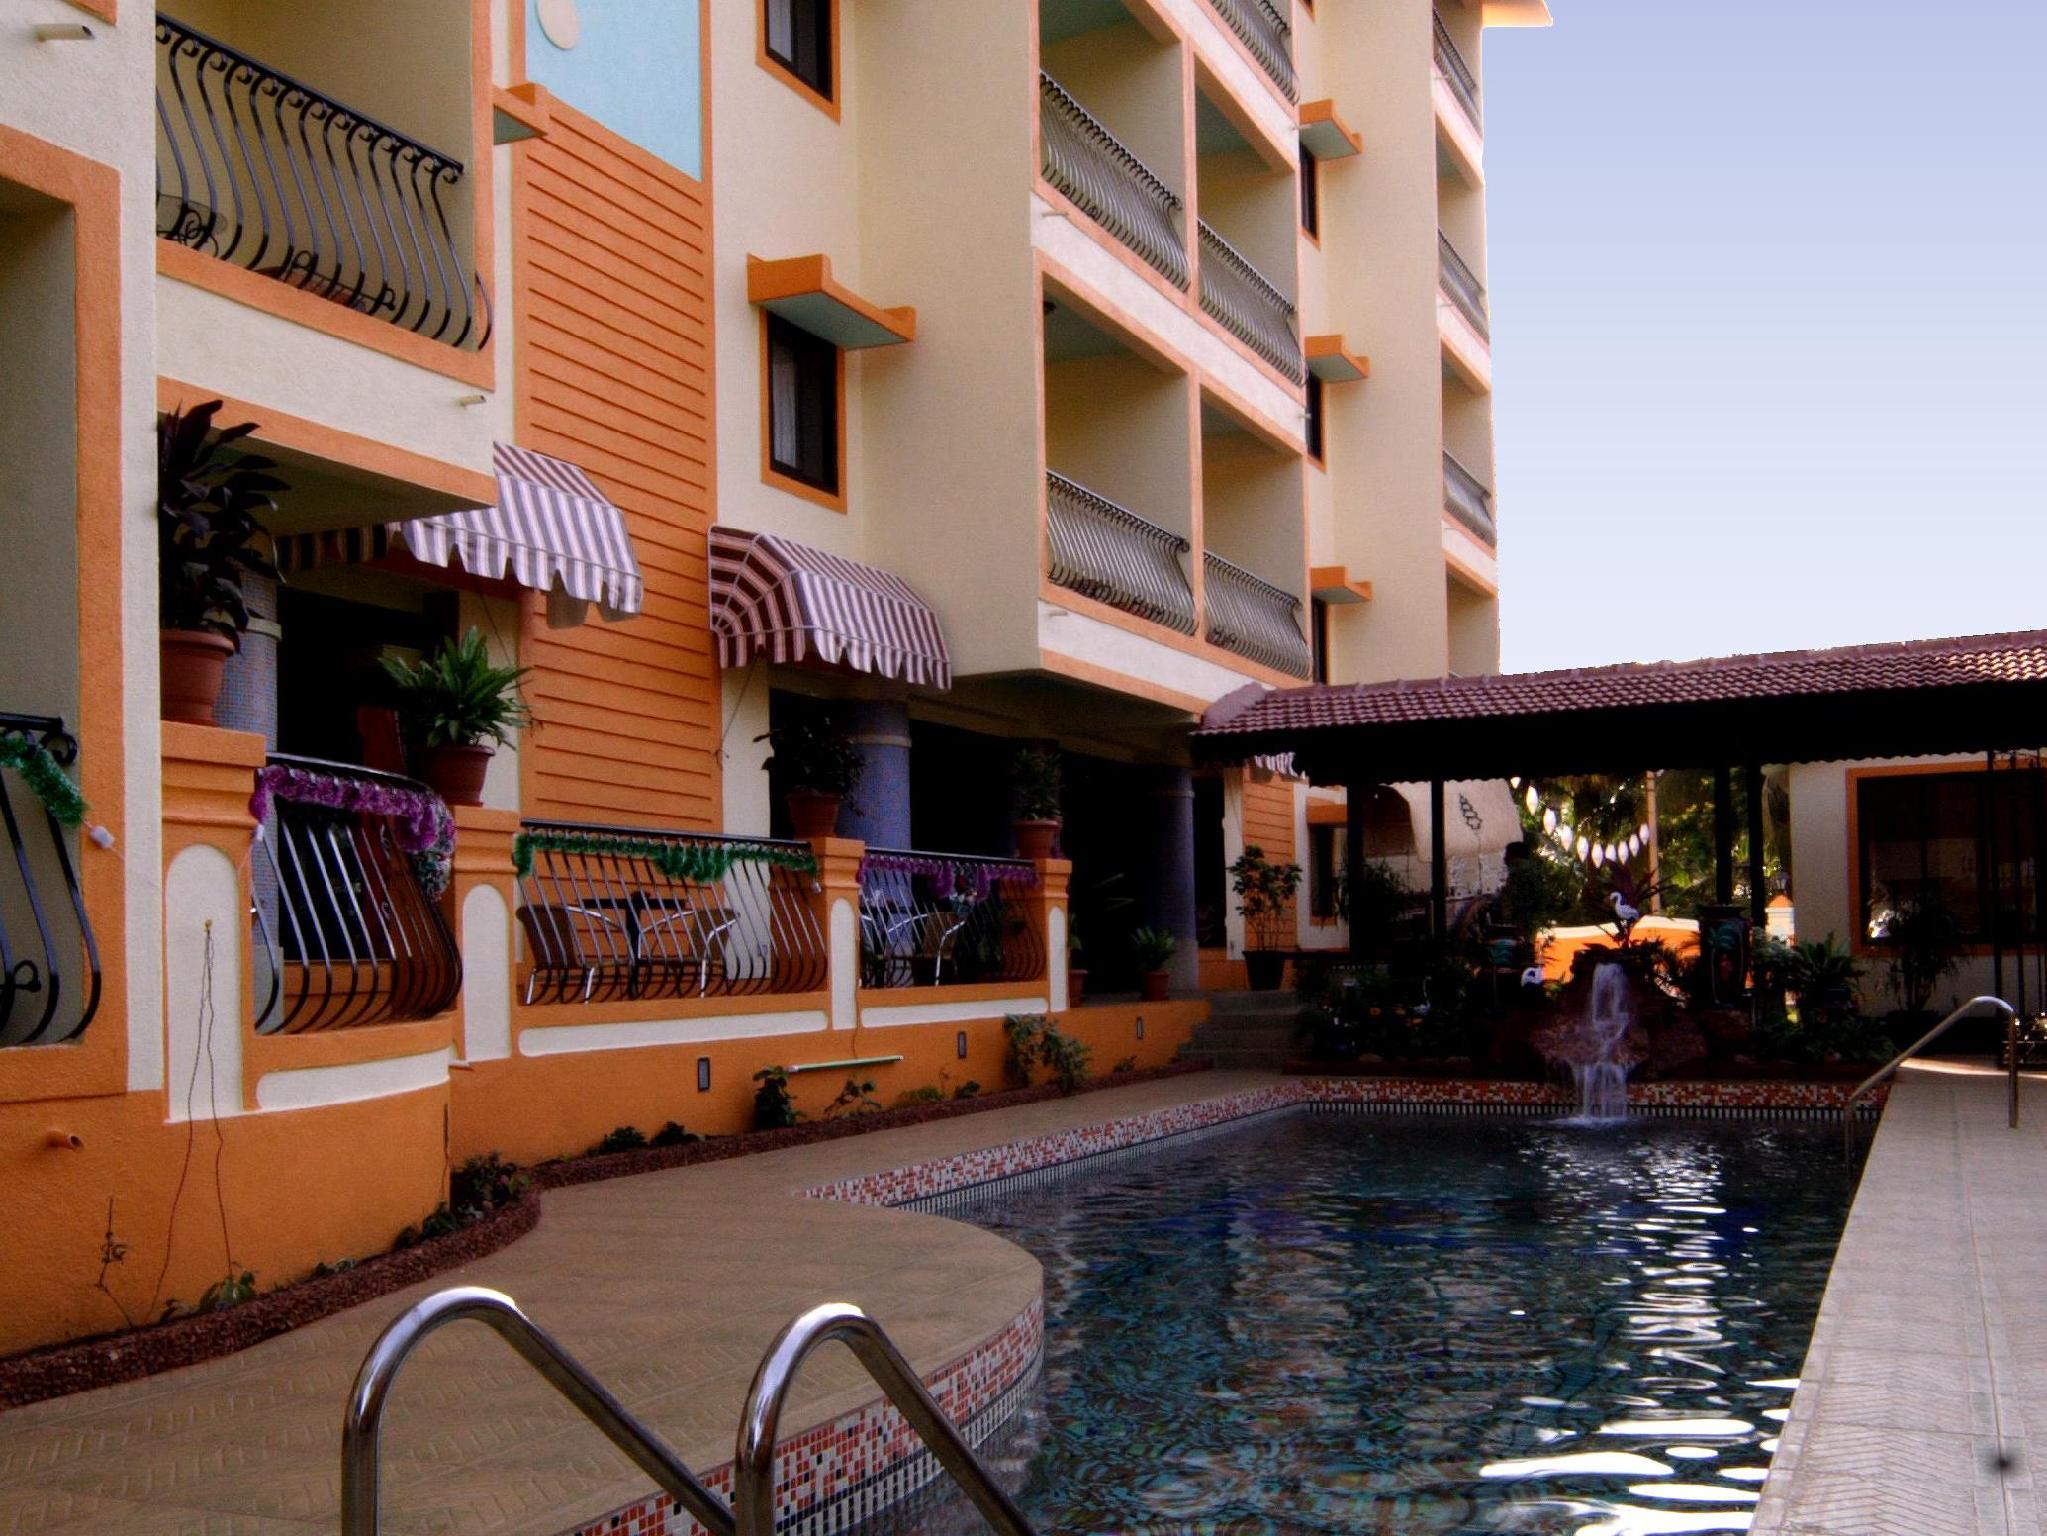 Sodders Svelton Manor Hotel